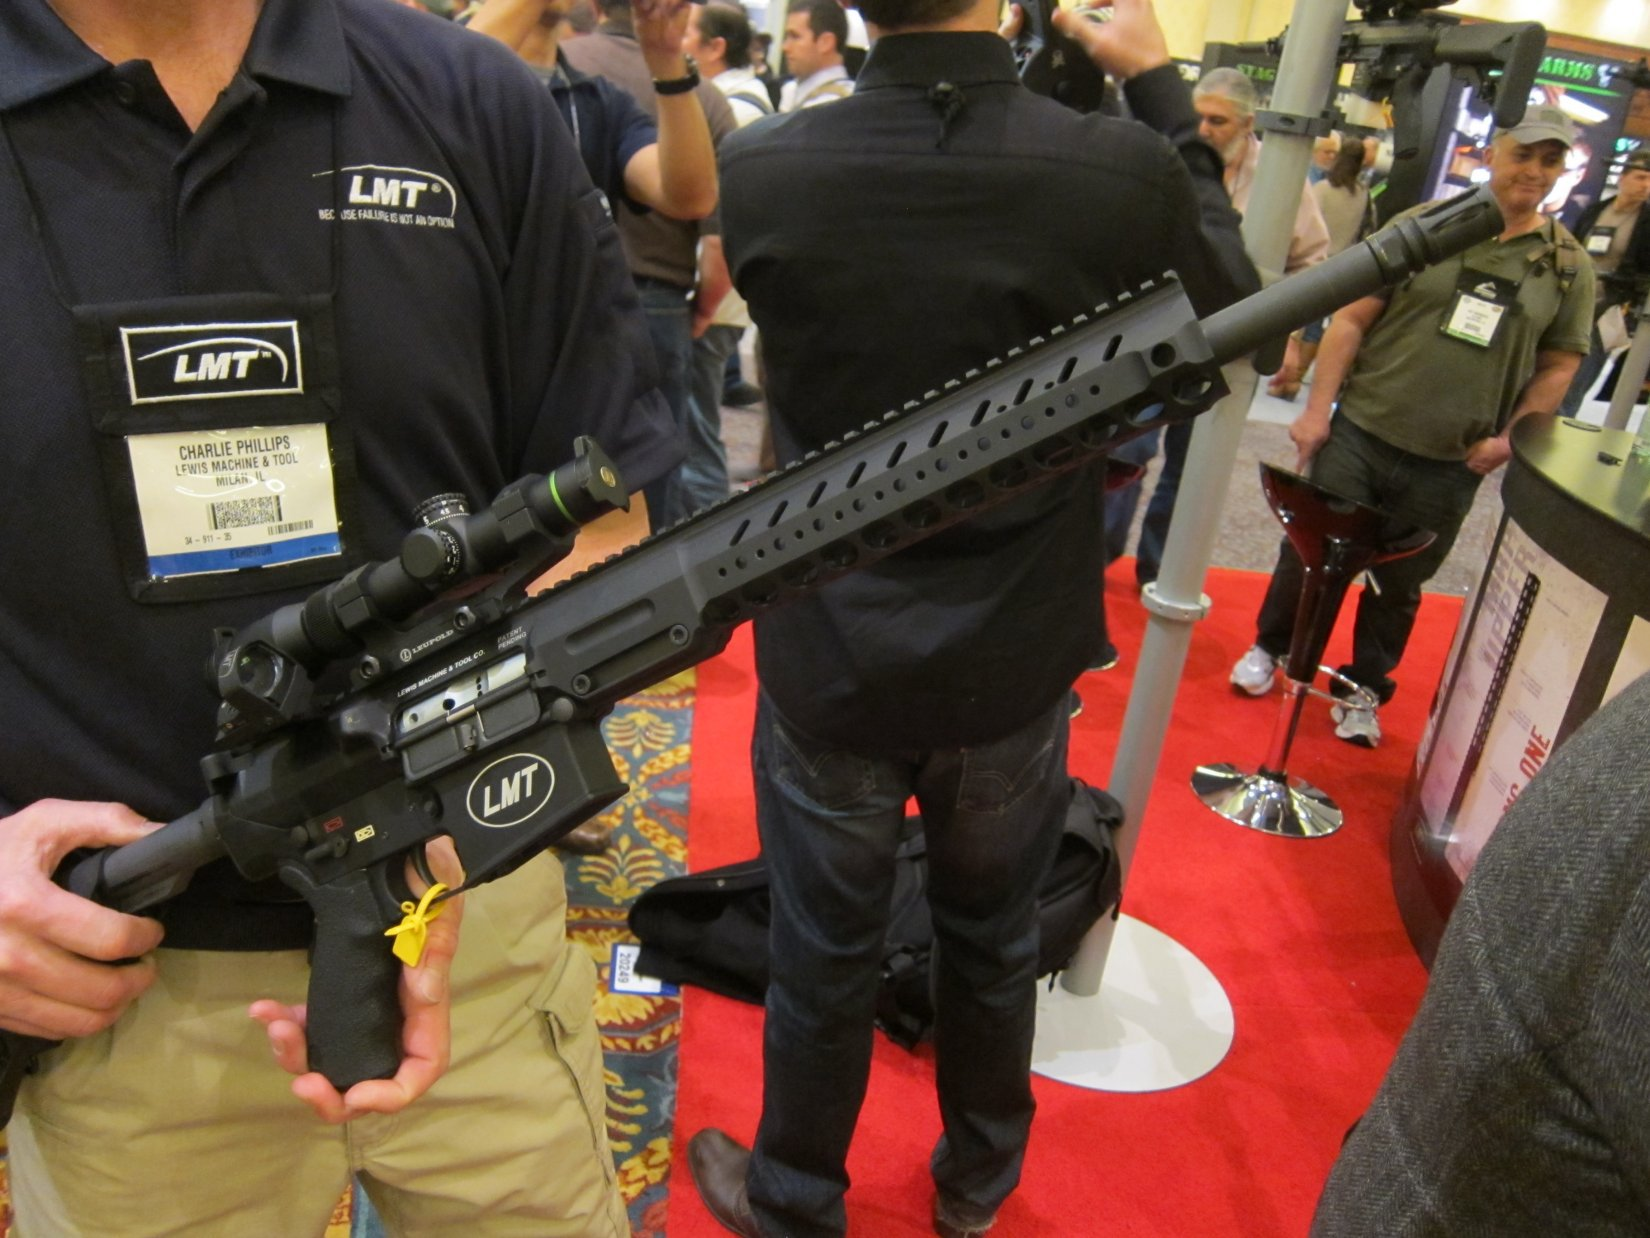 "Lewis Machine & Tool LMT LM8MWS (also written LM8 MWS) 16″ ""Slick Receiver"" Monolithic Rail Platform 7.62mm NATO/.308 Win. Tactical AR-10/SR-25-Type Battle Rifle/Carbine Upper Receiver(s) with Lightweight Modular Rail System"